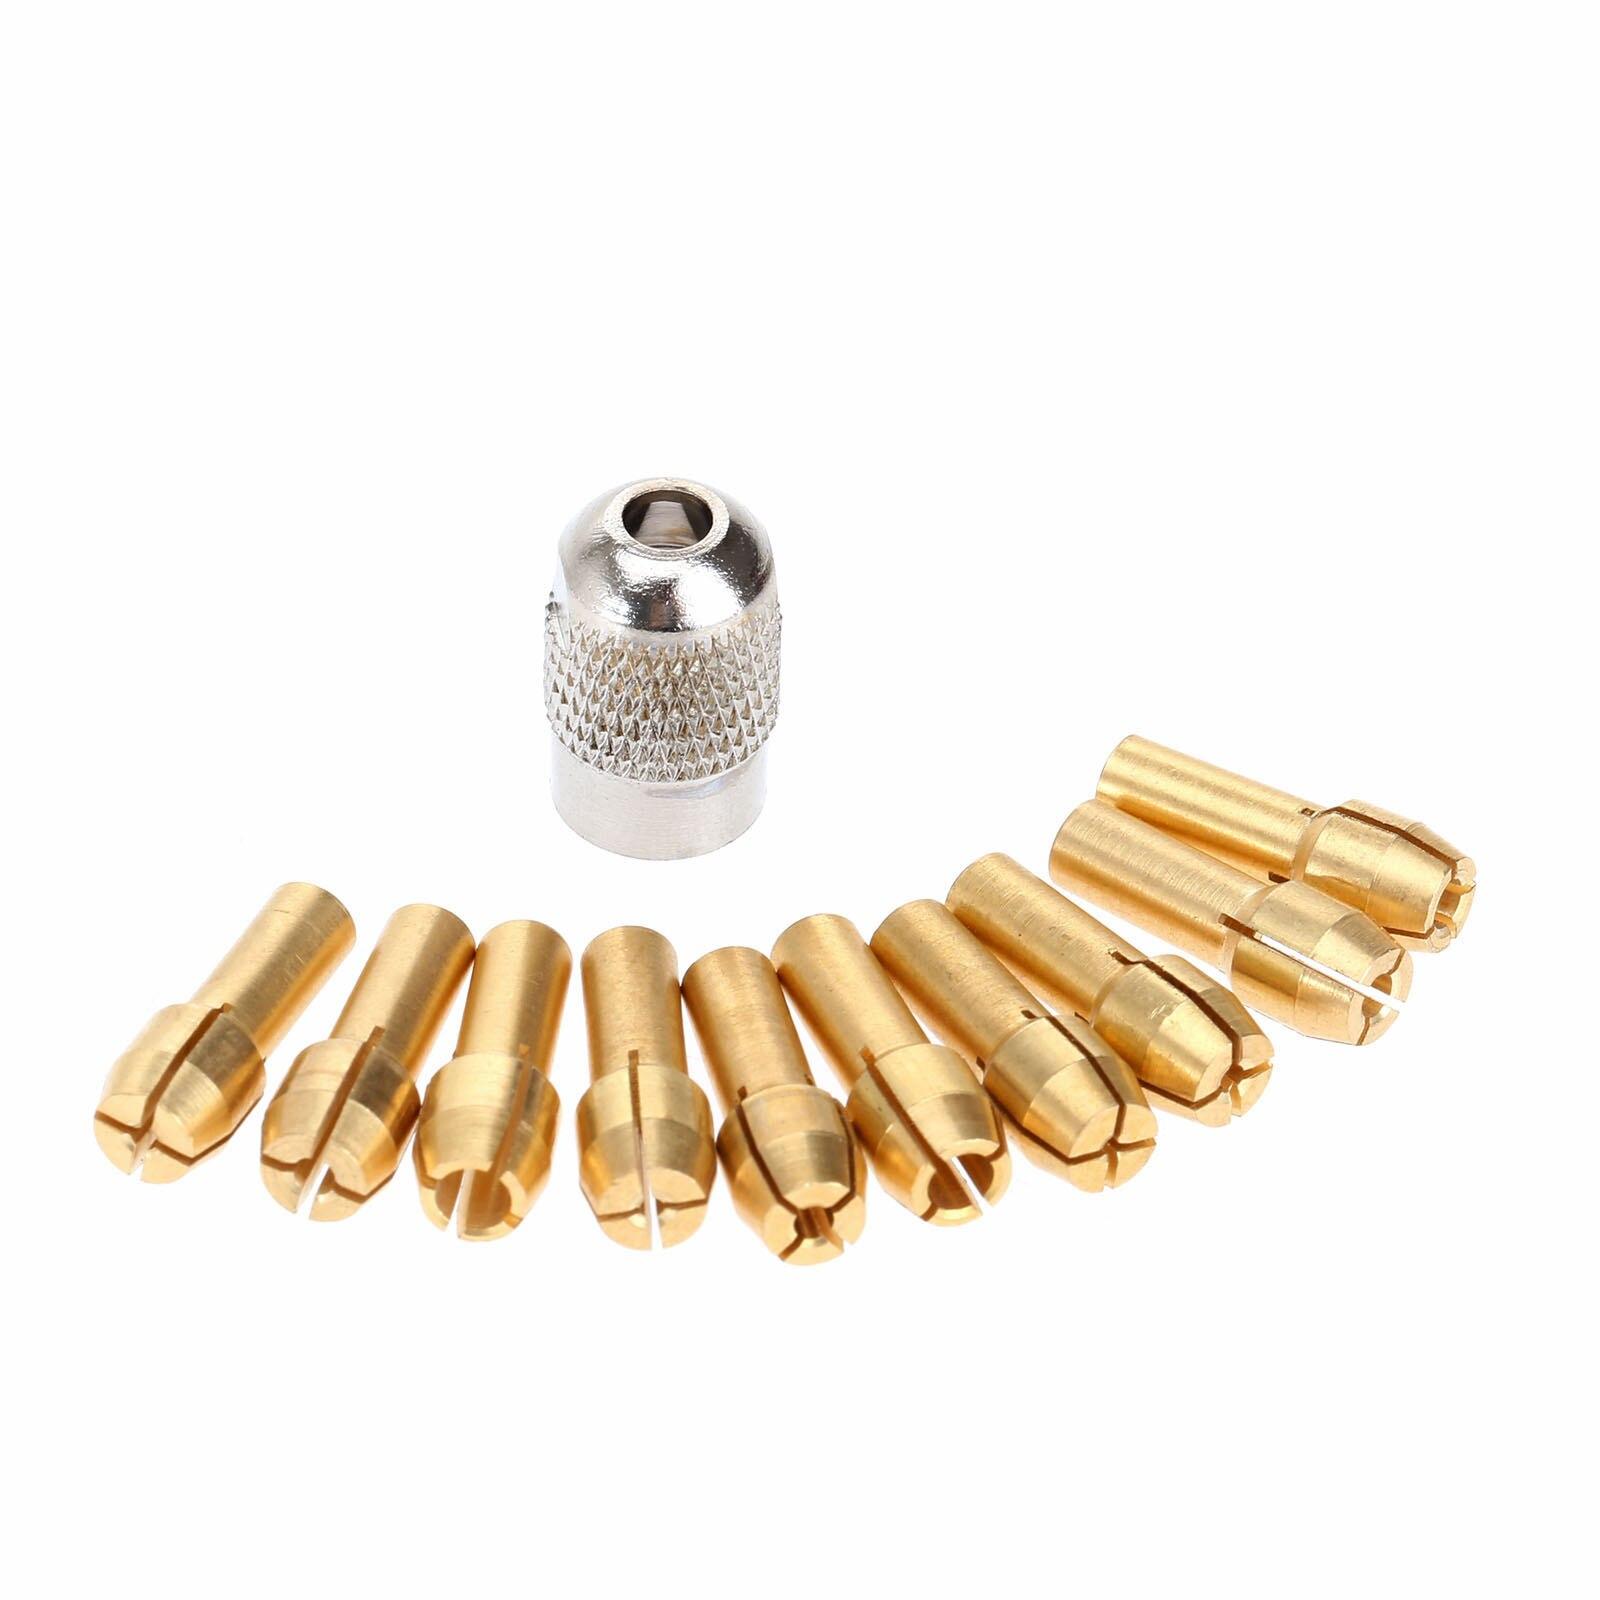 Dophee 0,5mm-3,2mm latón Dremel Collet Mini portabrocas 4,3mm caña para Dremel herramienta rotativa + 1Pc 8x0,75 Mill del eje tornillo tapa de tuerca